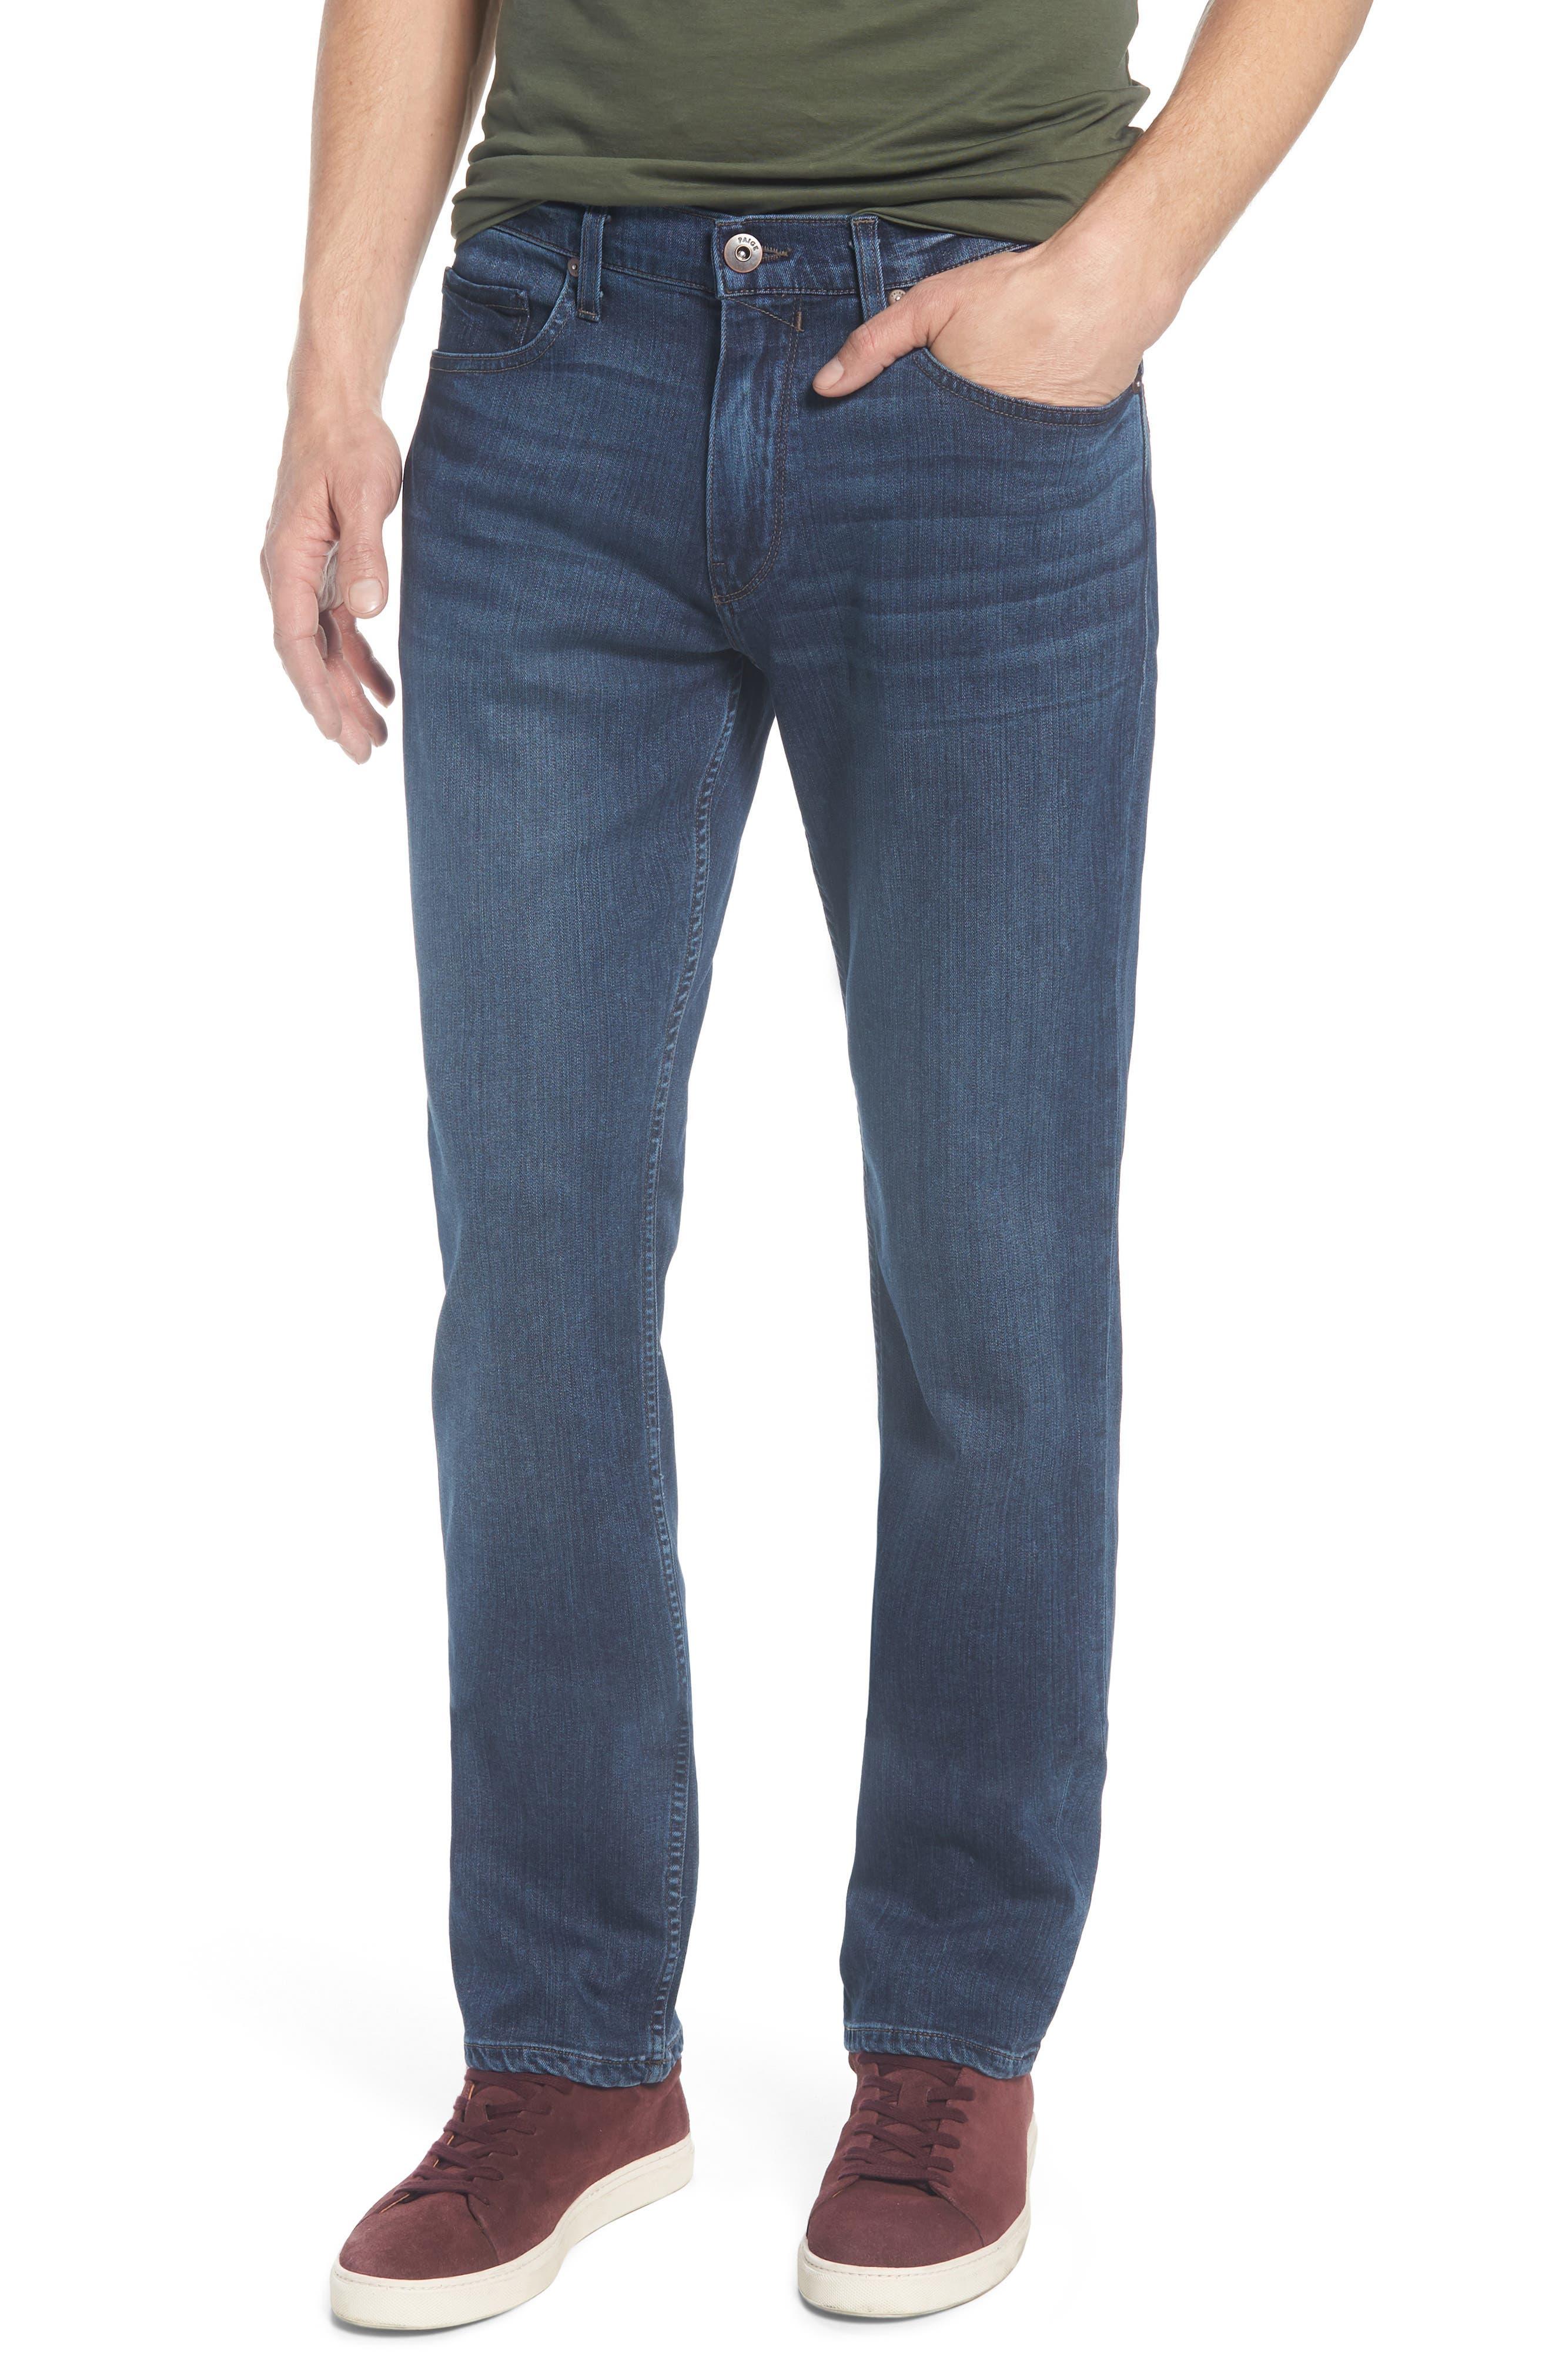 Normandie Straight Leg Jeans,                             Main thumbnail 1, color,                             Lowe